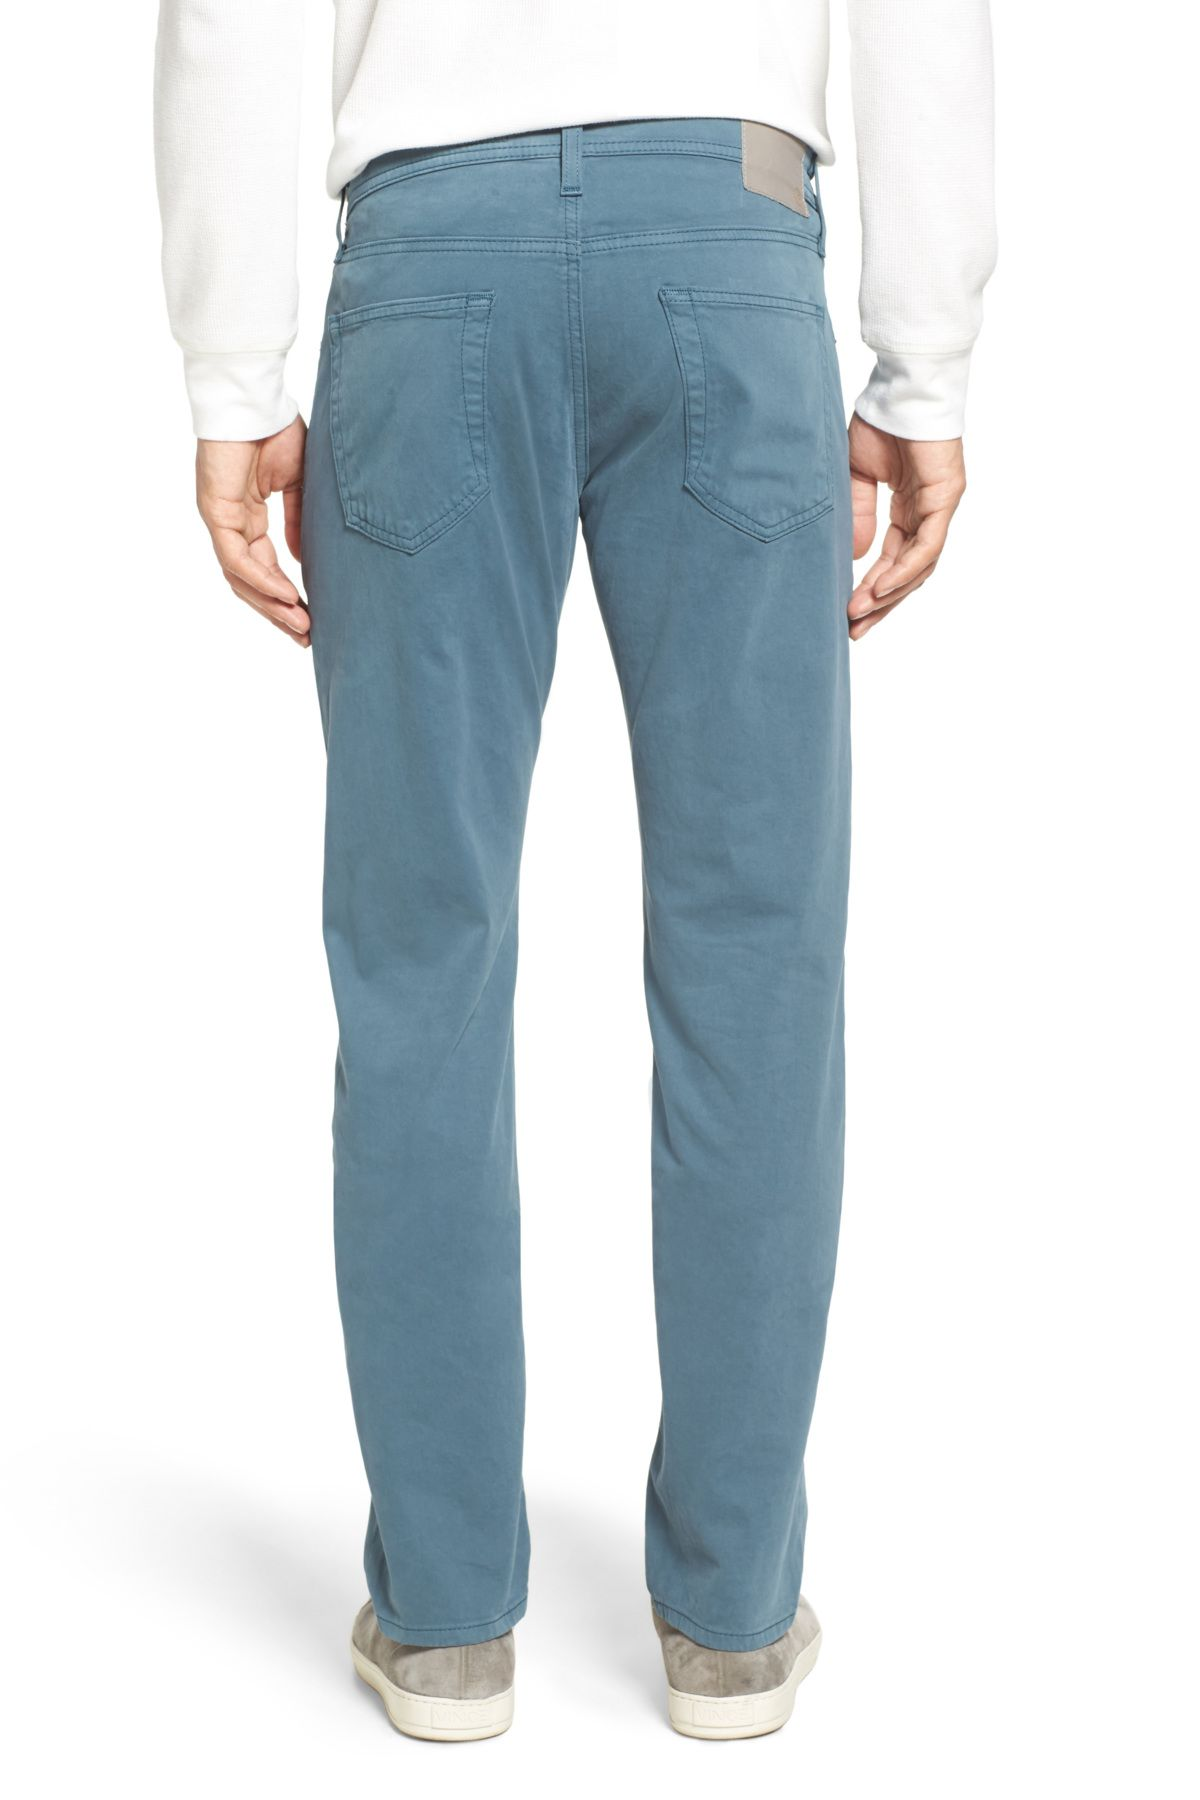 Tellis SUD Modern Slim Stretch Twill Pants - 34